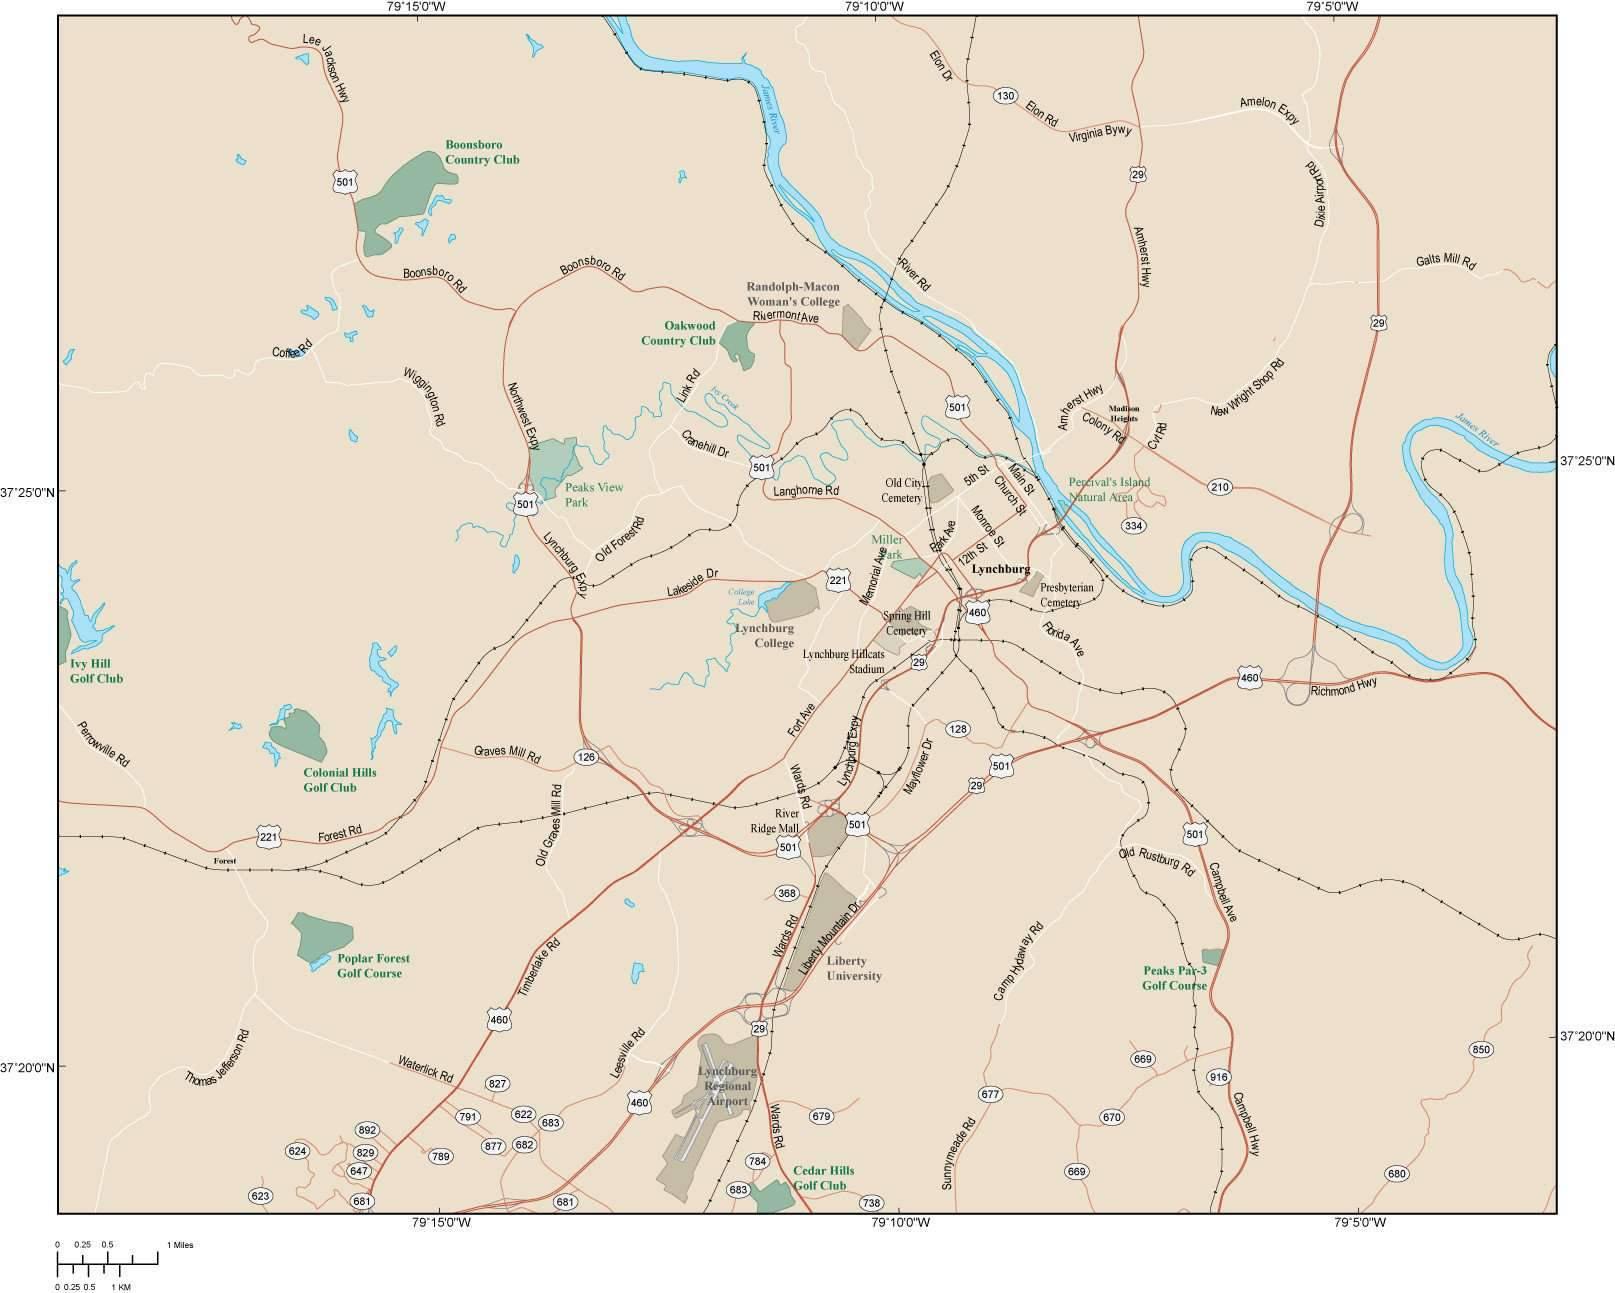 Map of the Lynchburg VA area